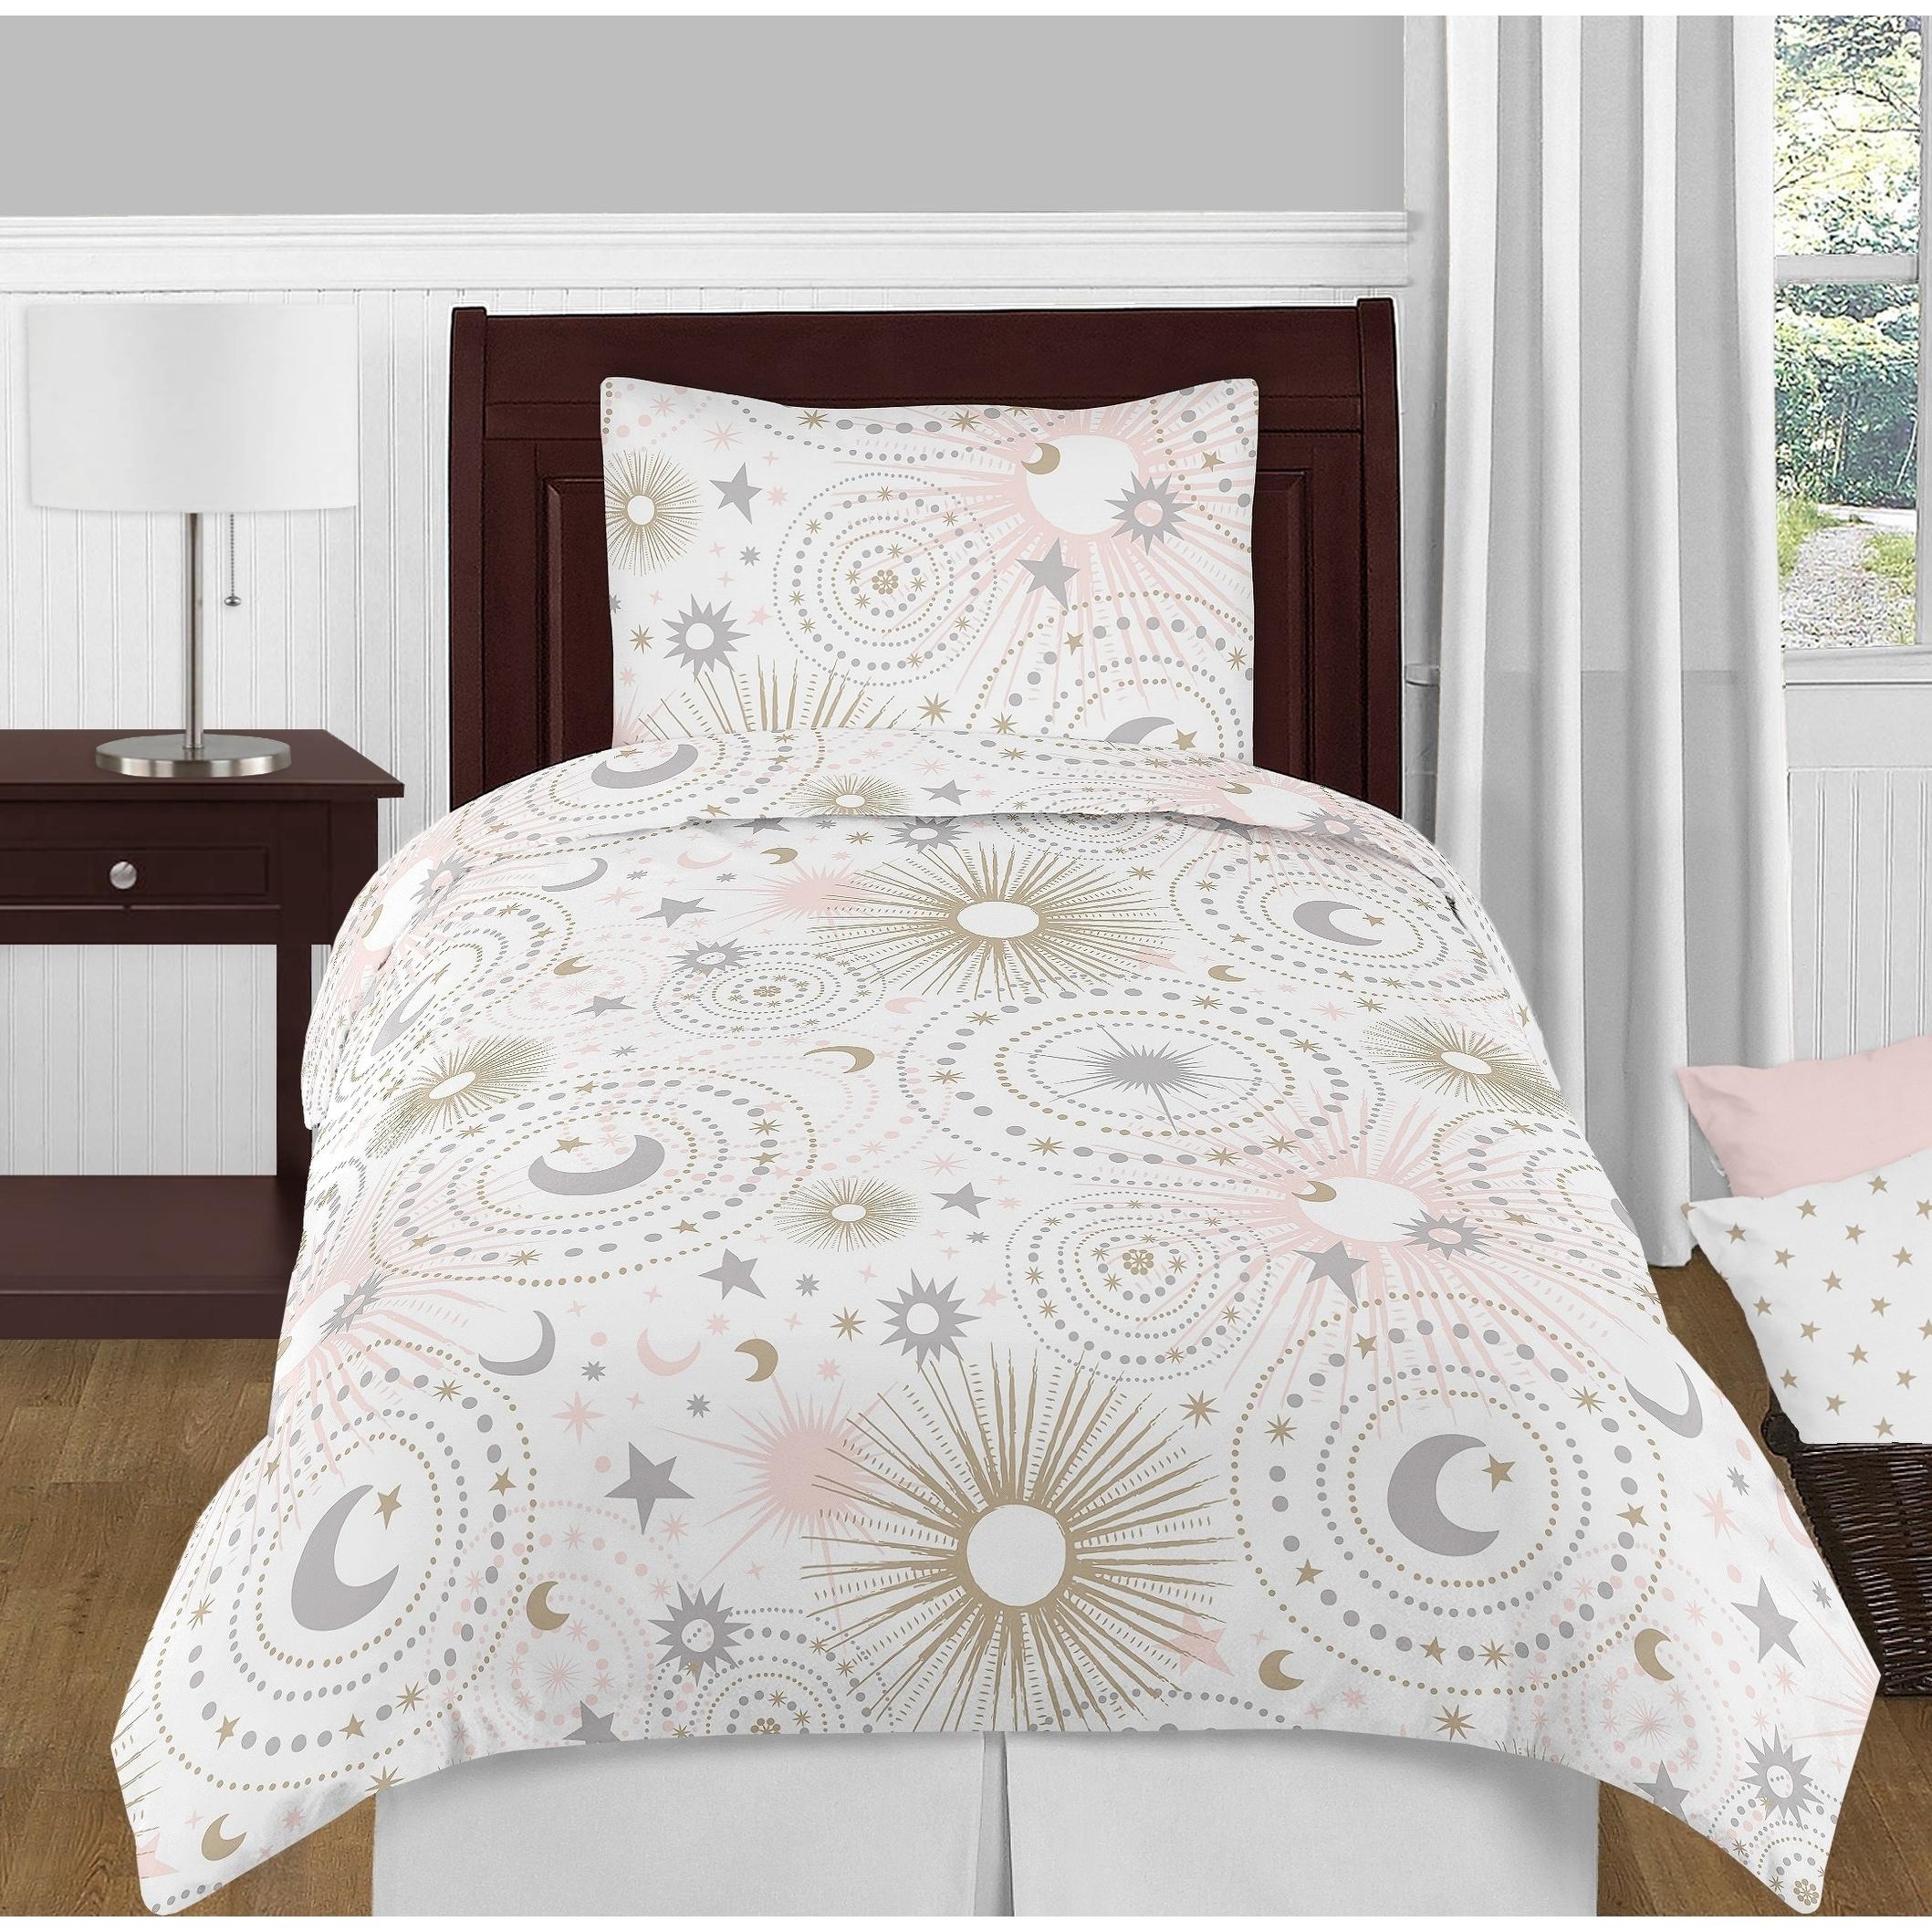 JoJo Designs Blush Pink, Gold, Grey and White Star Moon C...